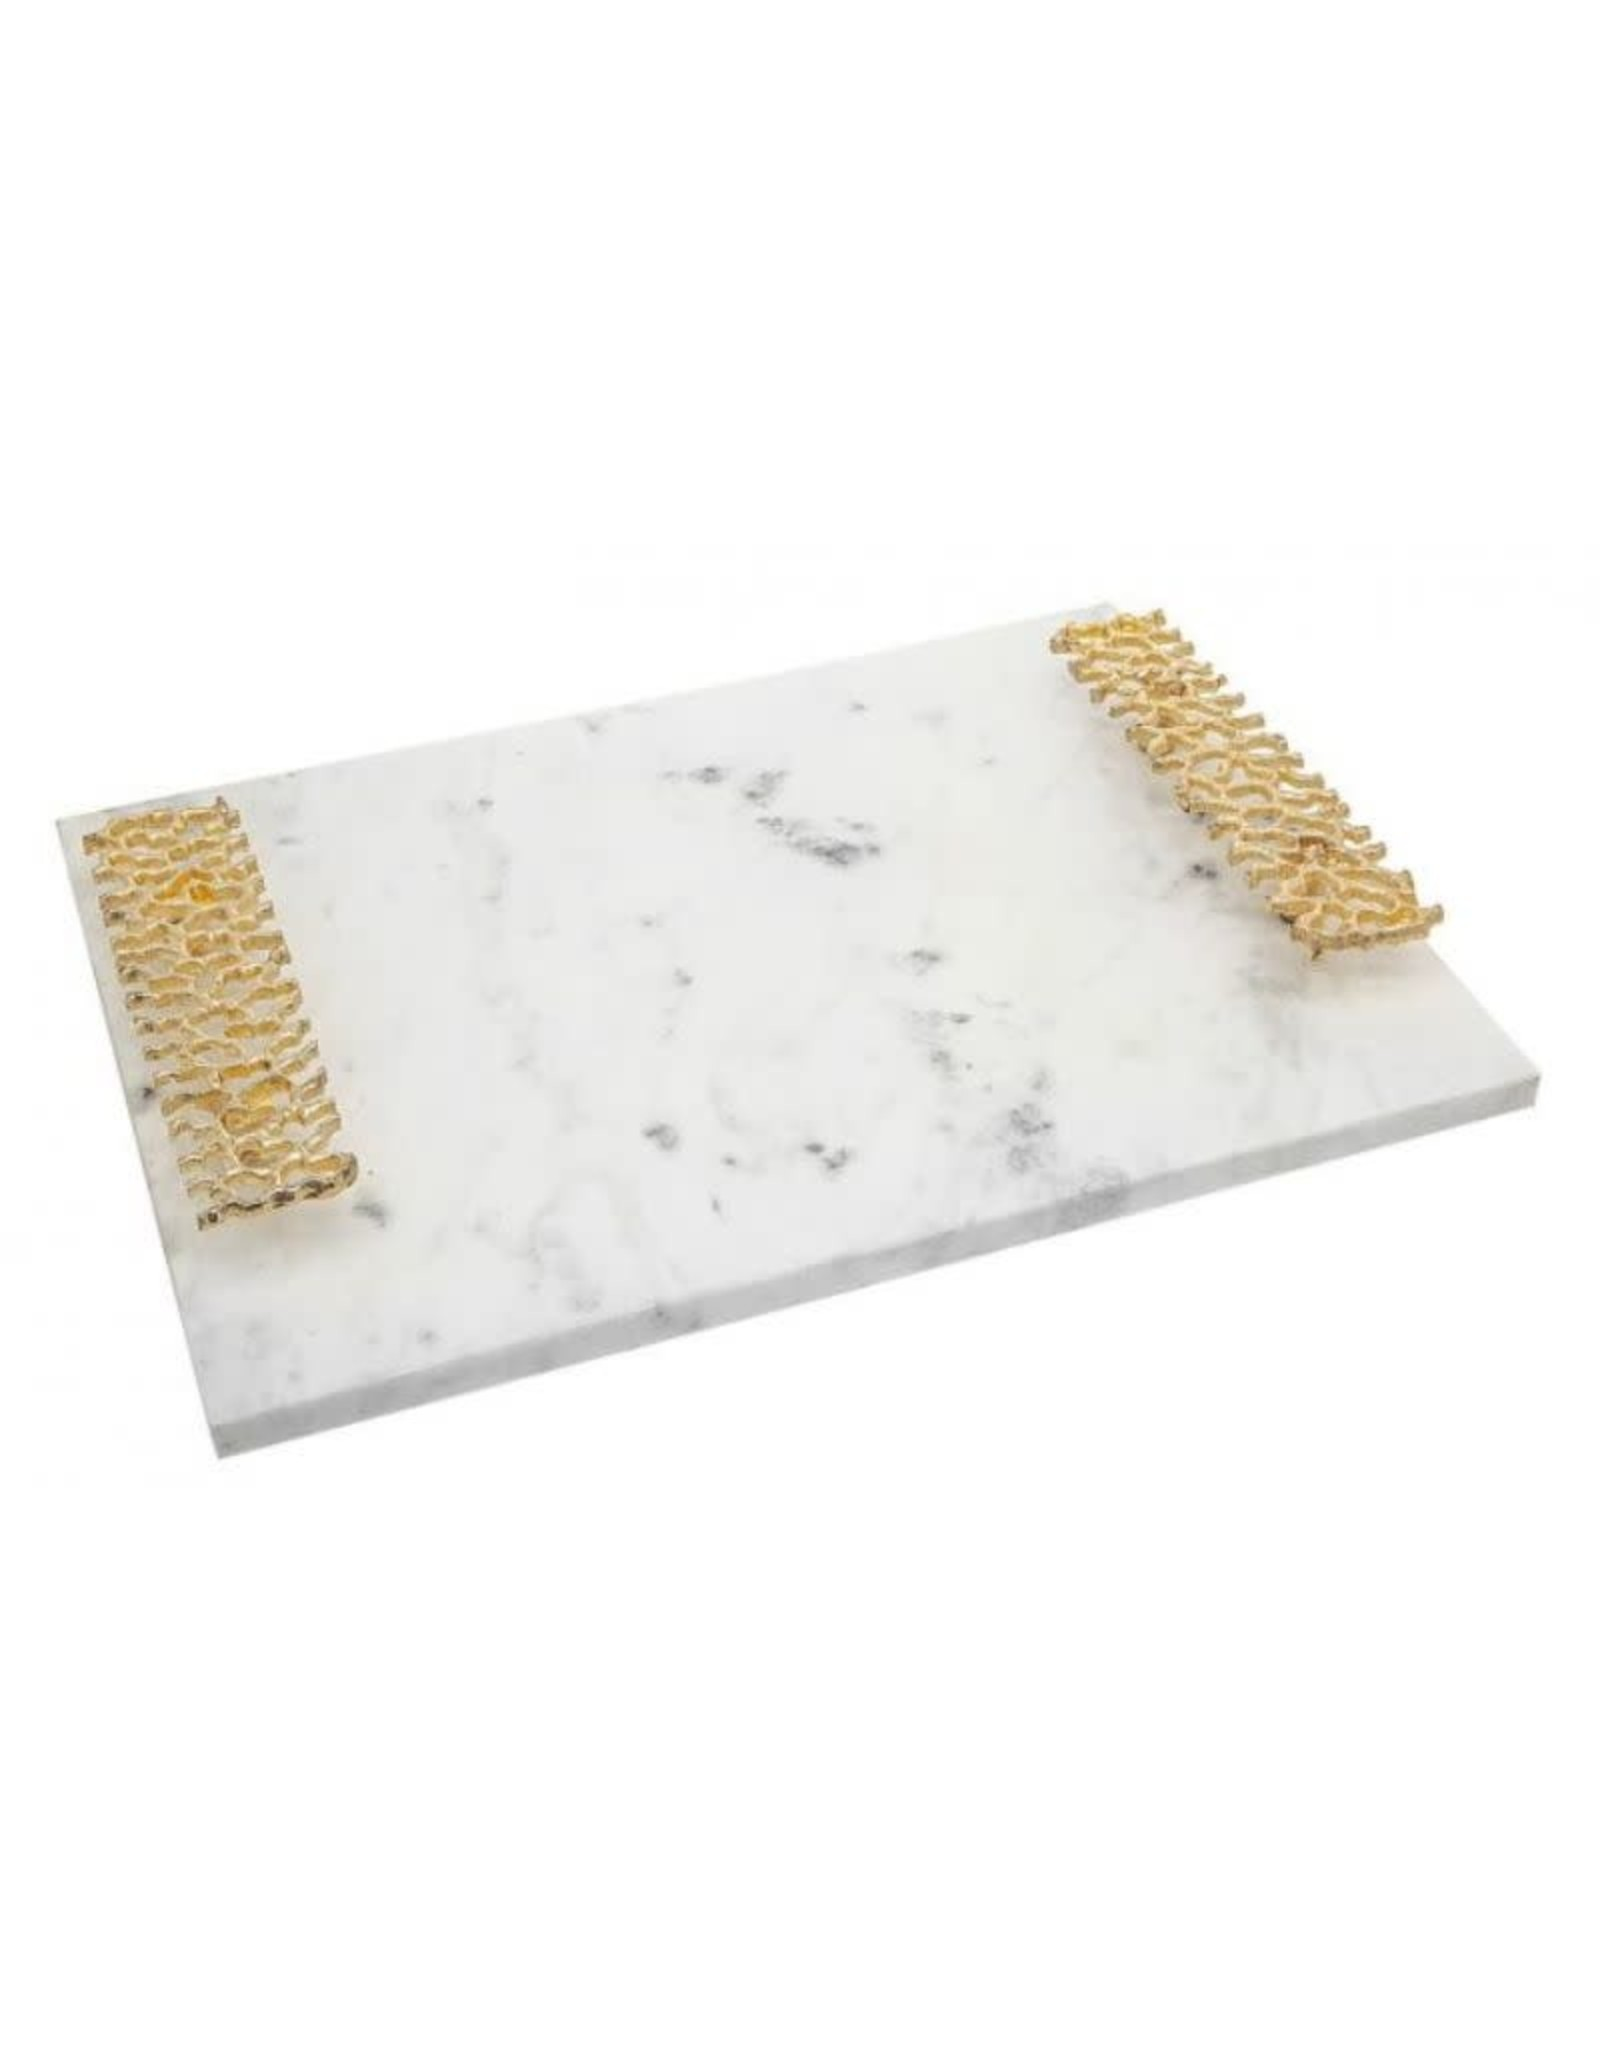 Godinger Pierced Handled Challah Board